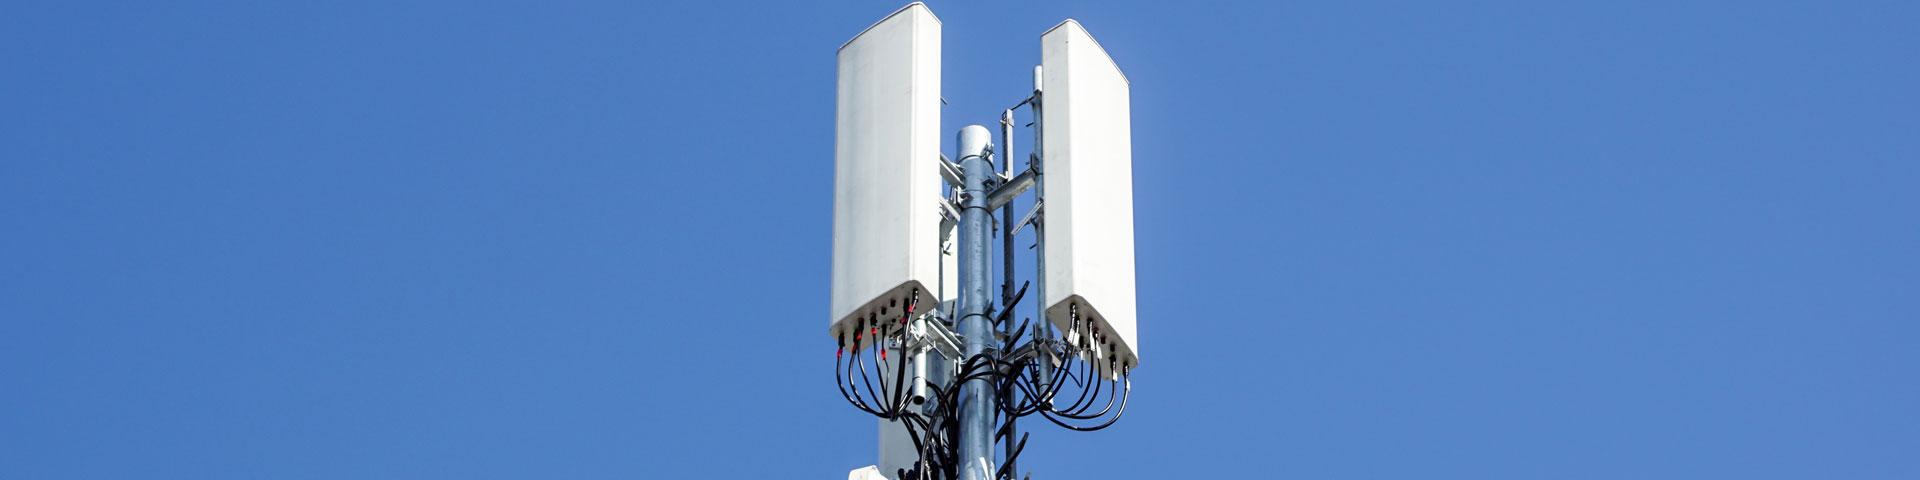 gsm netwerk antenne